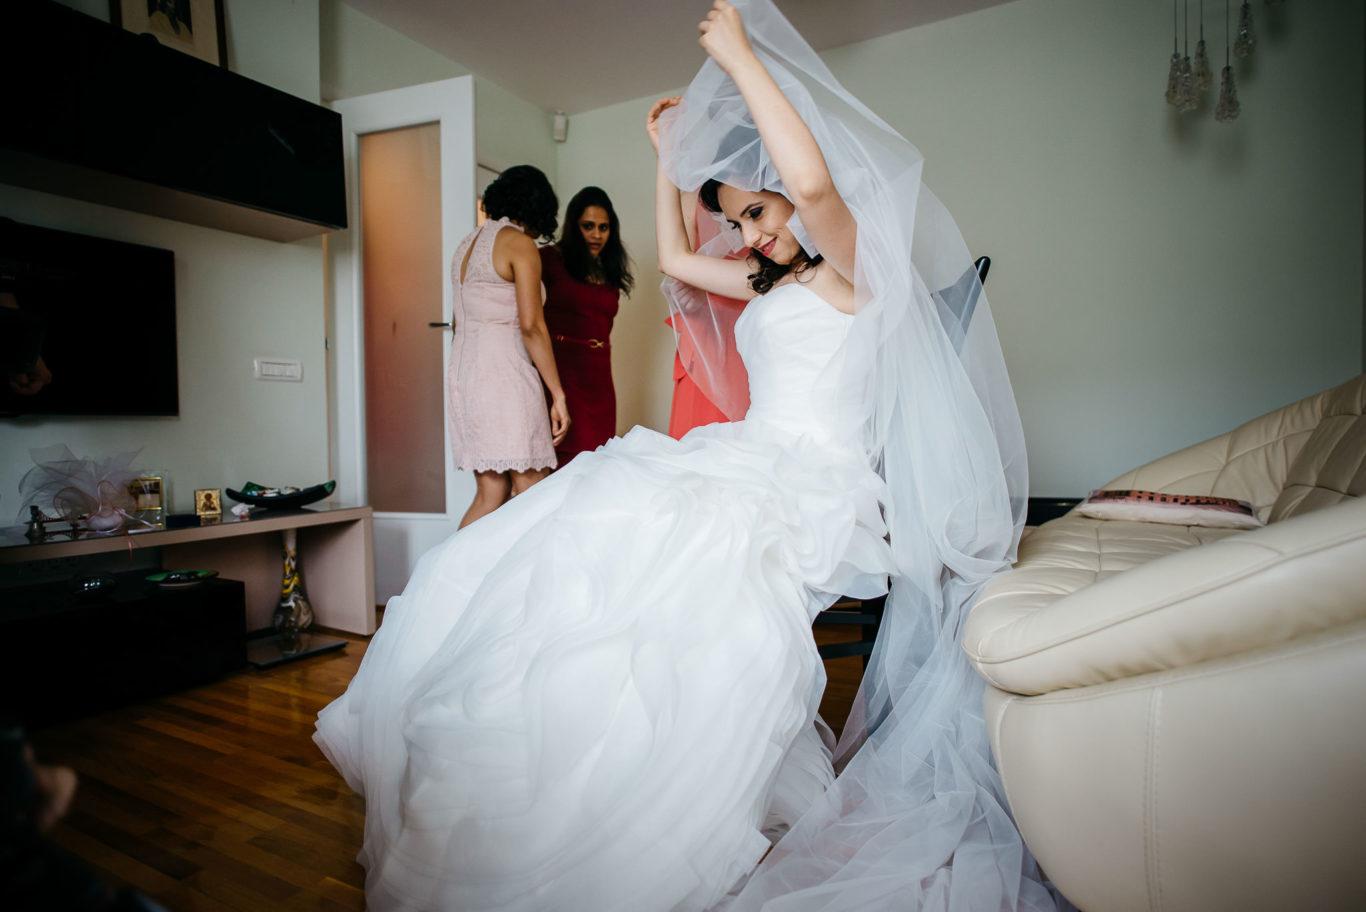 0218-Fotografie-nunta-Simona-Valentin-fotograf-Ciprian-Dumitrescu-DSC_1024